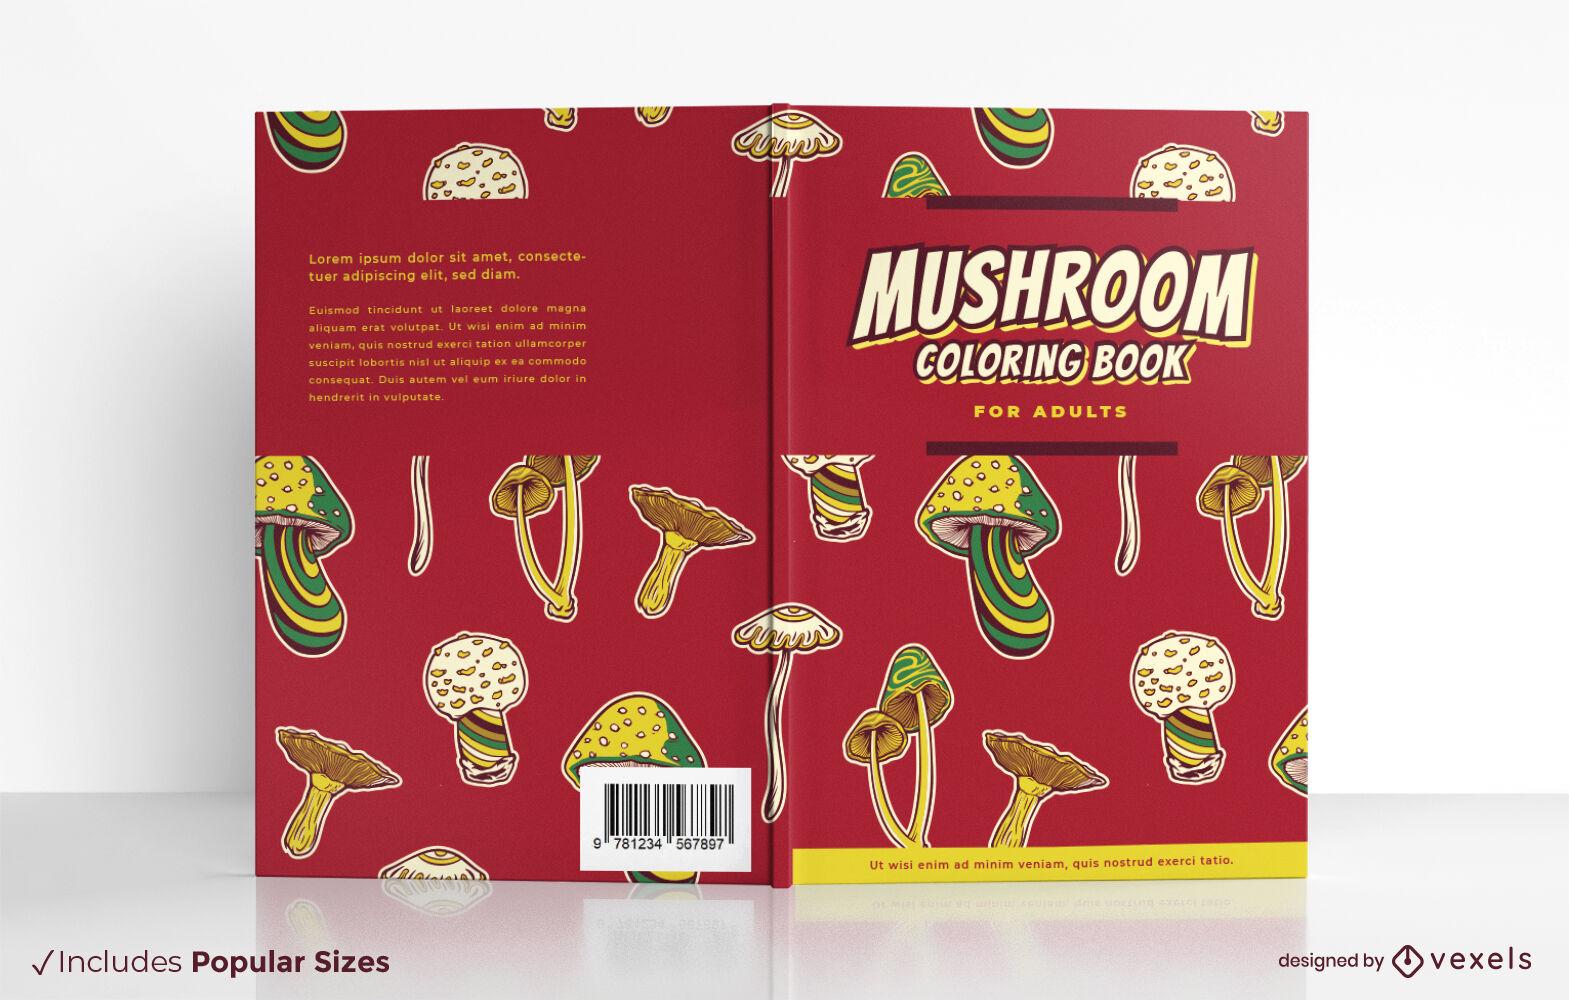 Cool mushroom coloring book cover design